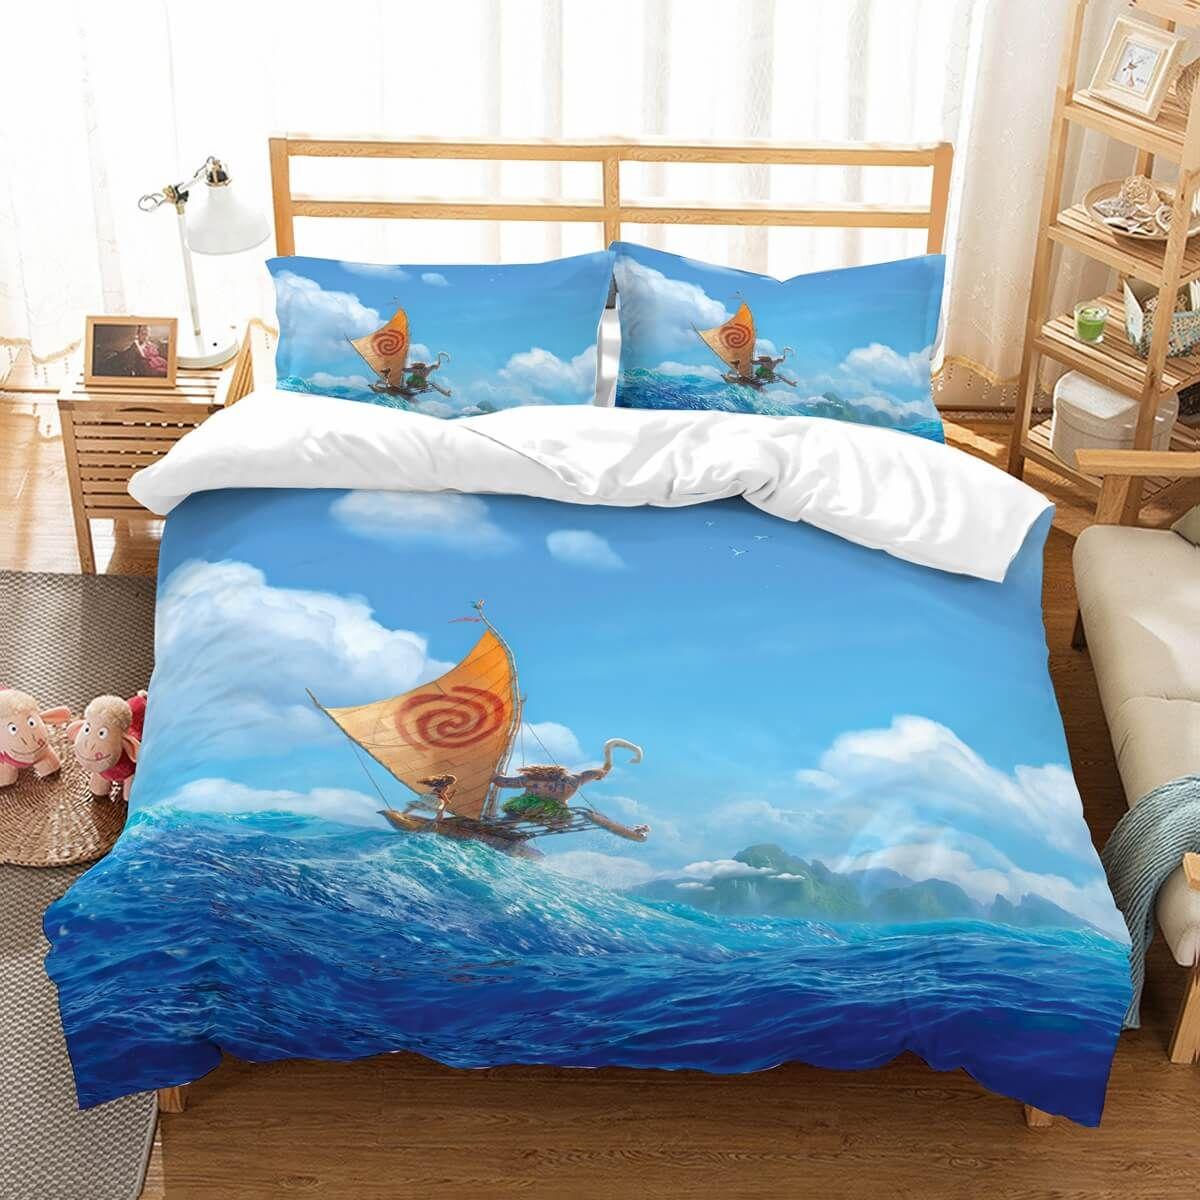 3d customize moana bedding set duvet cover set bedroom set